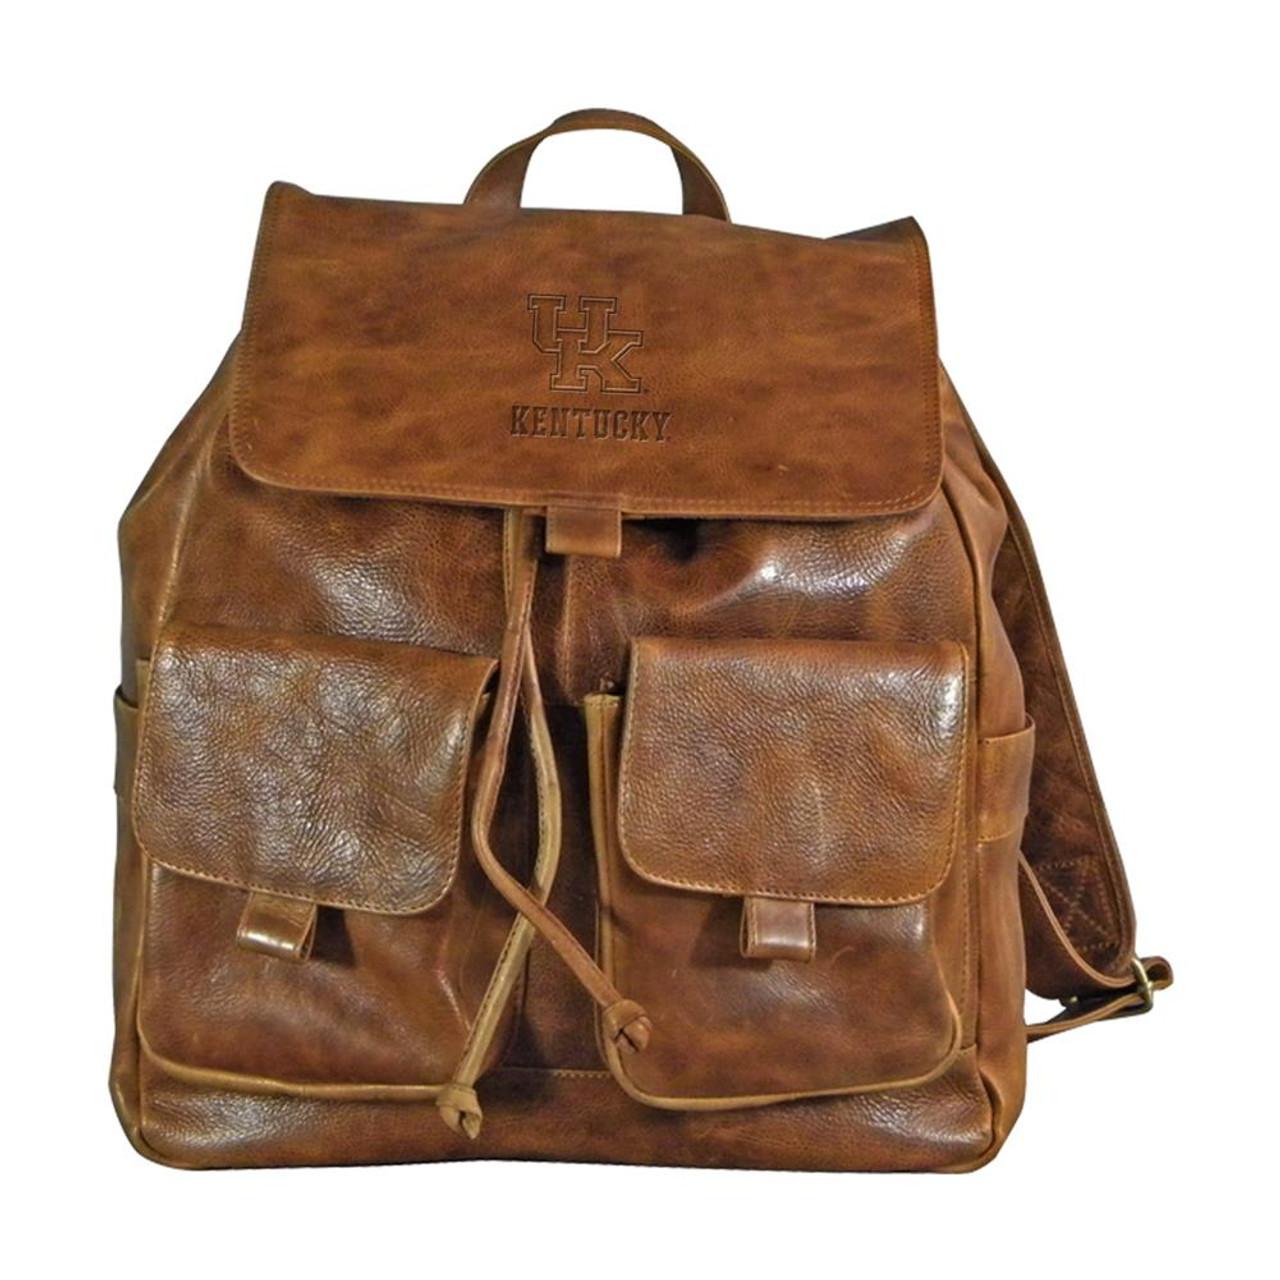 Kentucky Wildcats UK Leather Rucksack Tan Westbridge Backpack